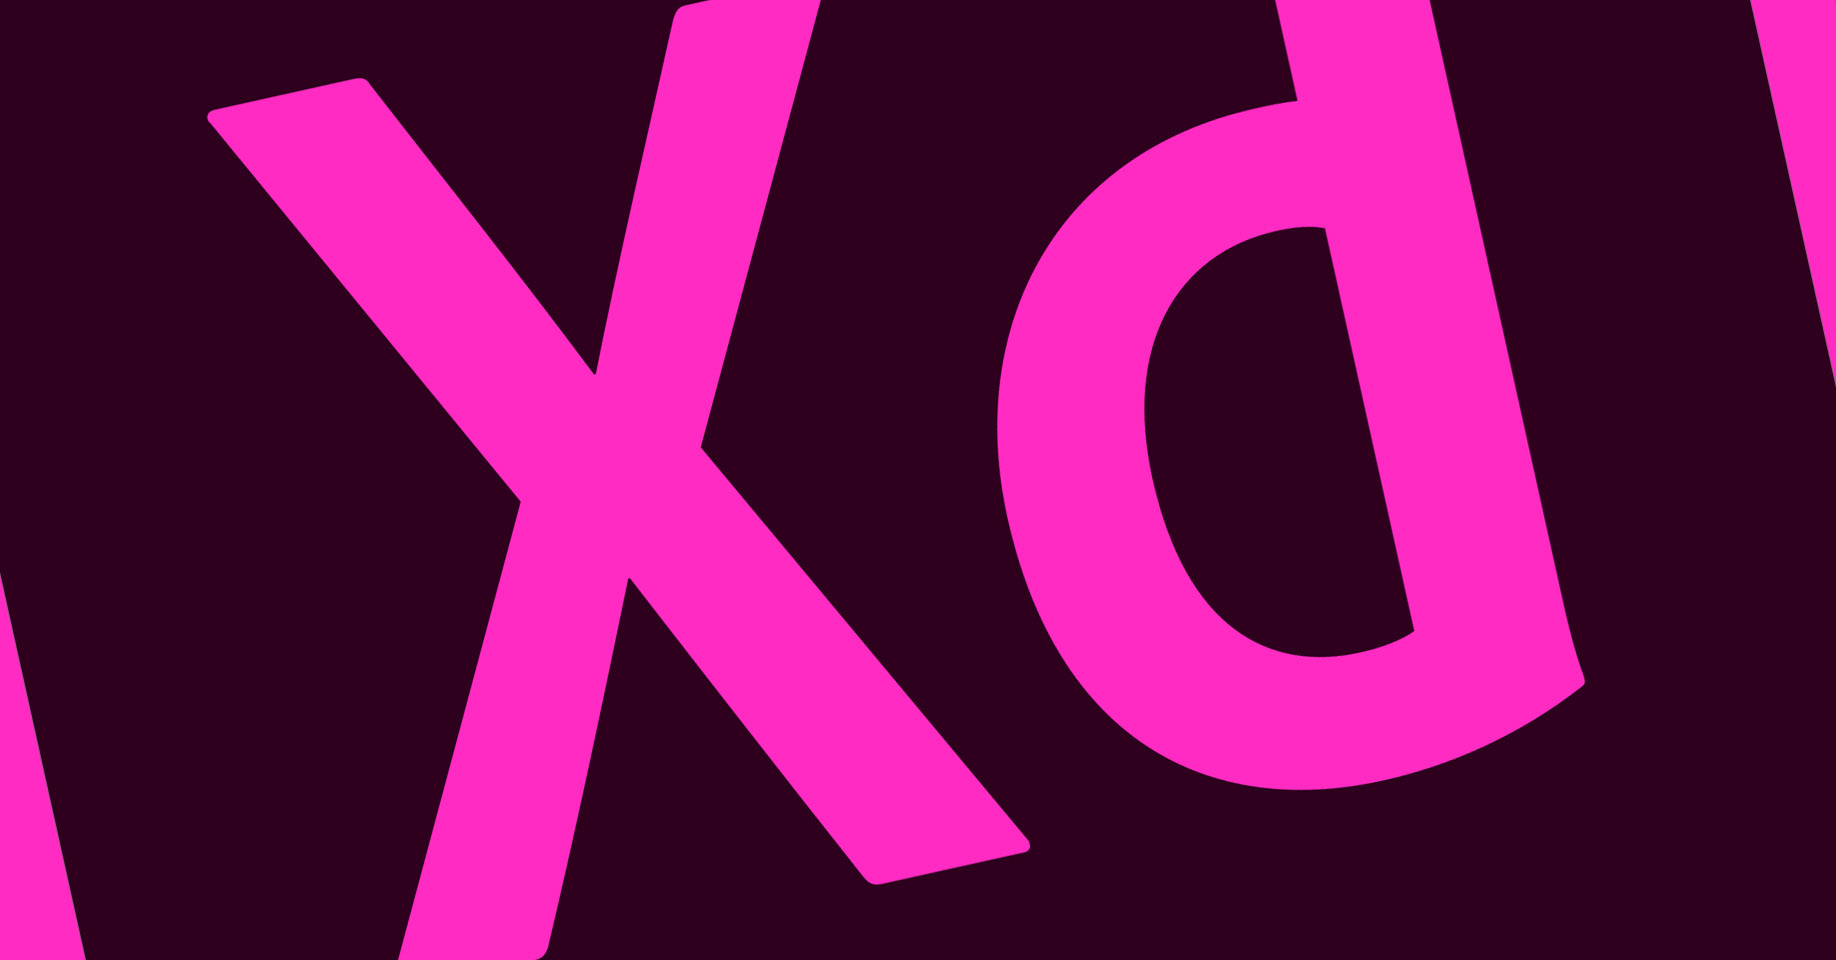 Adobe XD: grandi novità per l'UI/UX design